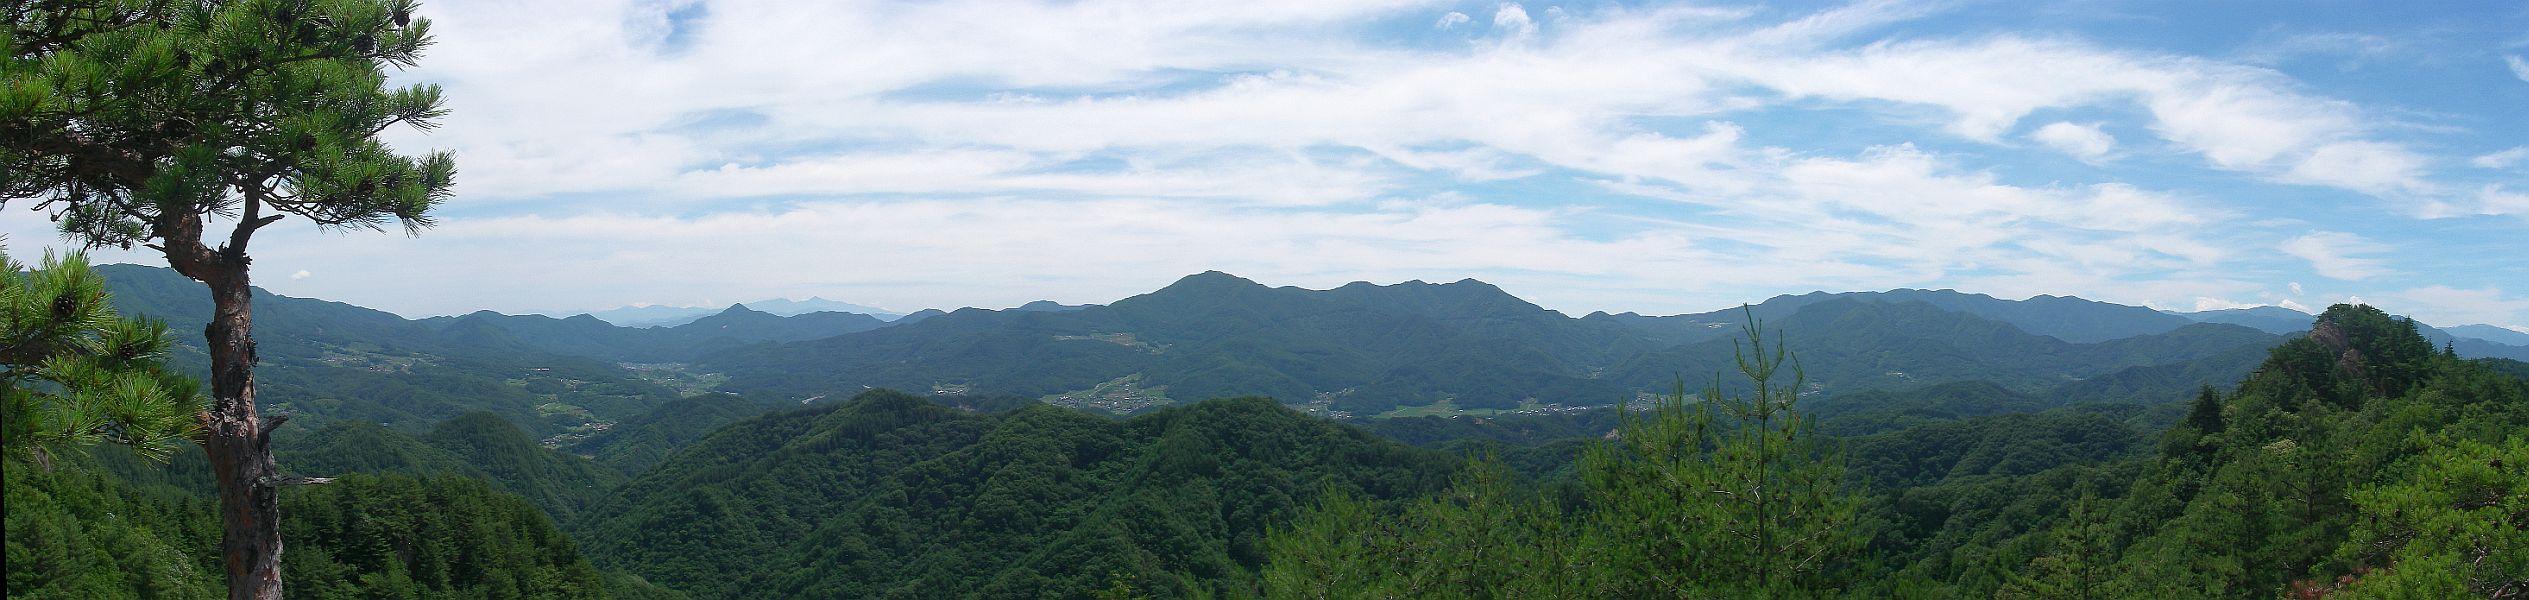 Iwadonoyama08.jpg